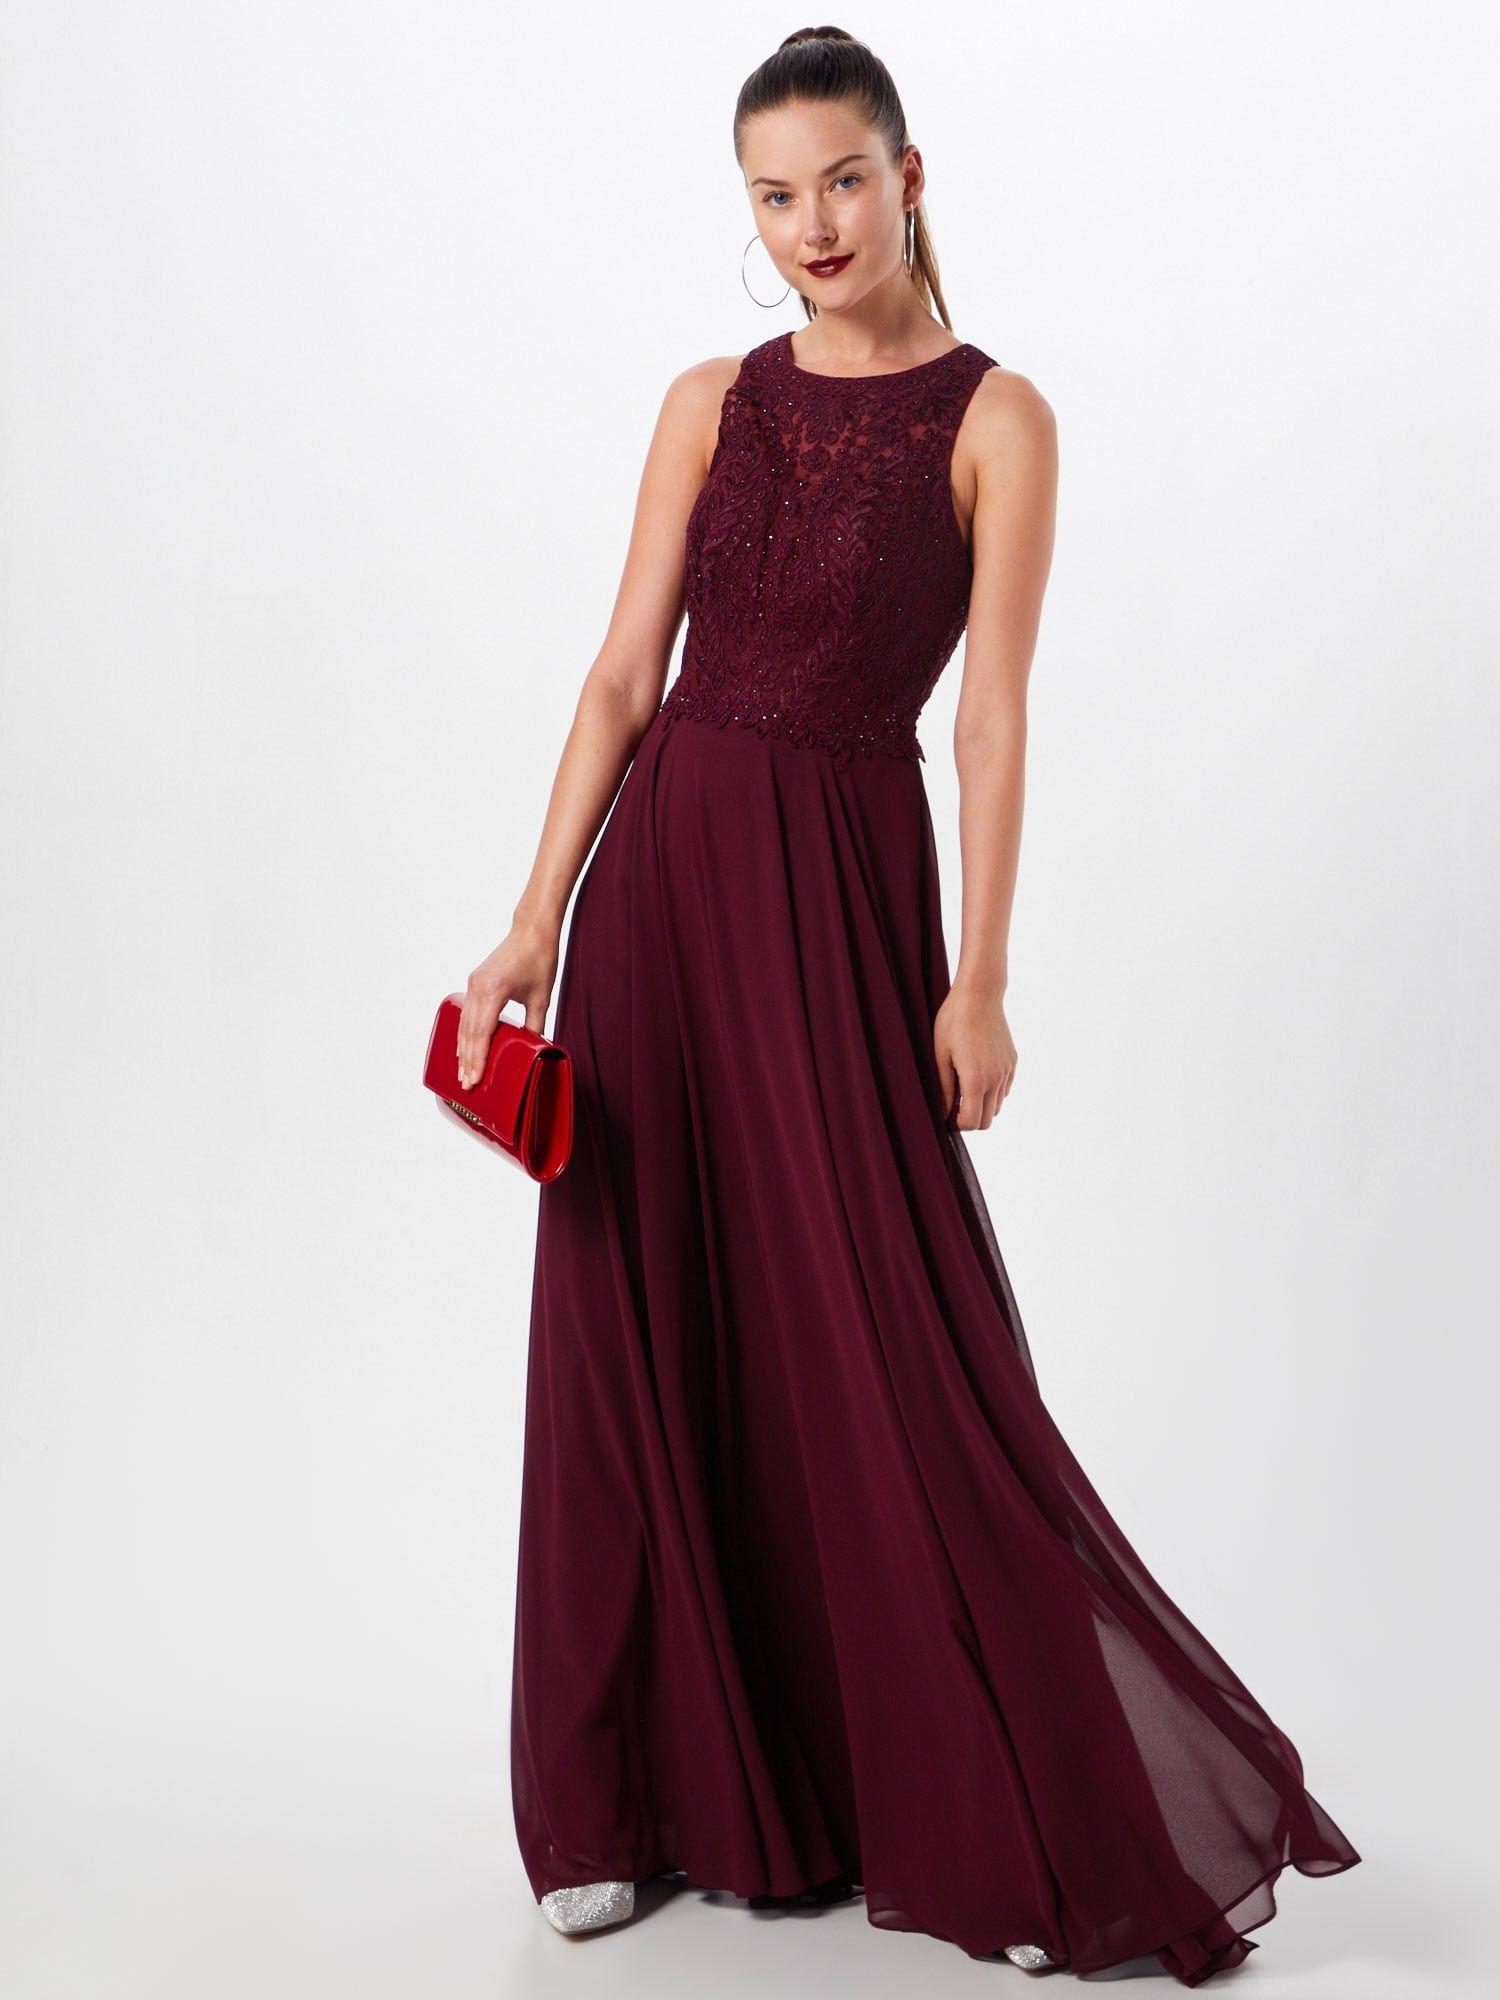 LUXUAR Abendkleid Damen, Bordeaux, Größe 20  Abendkleid